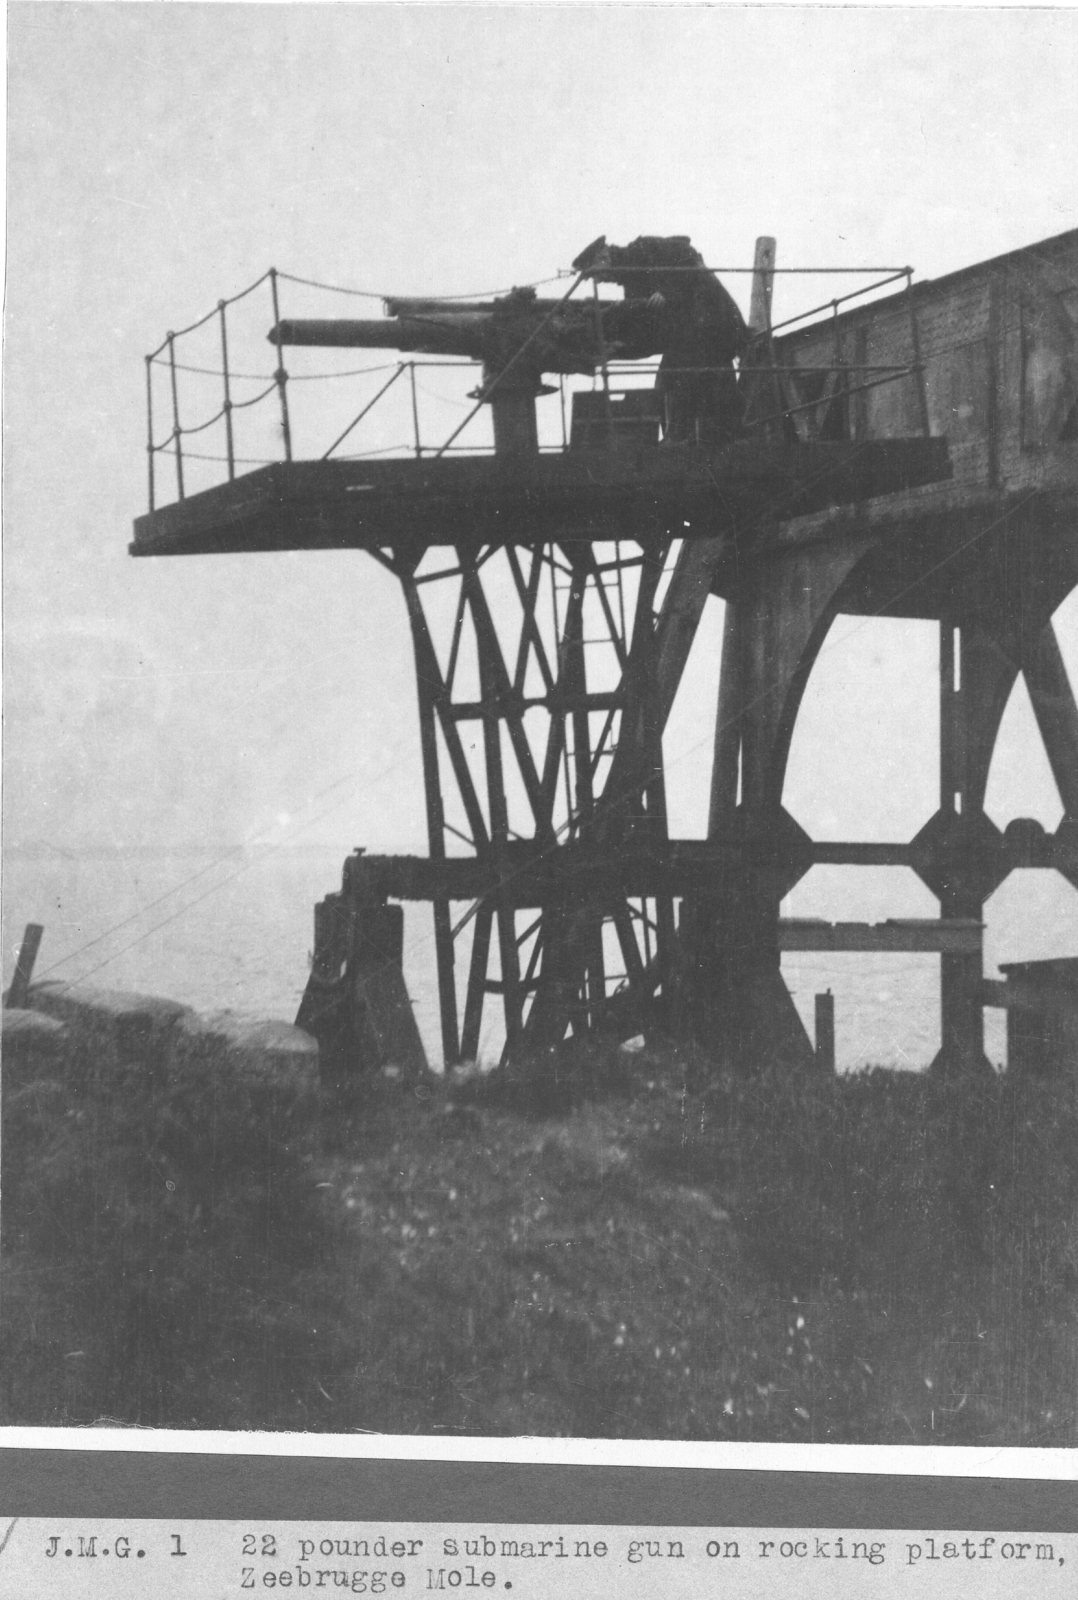 Submarine gun mounted on rocking platform. Zeebrugge Mole